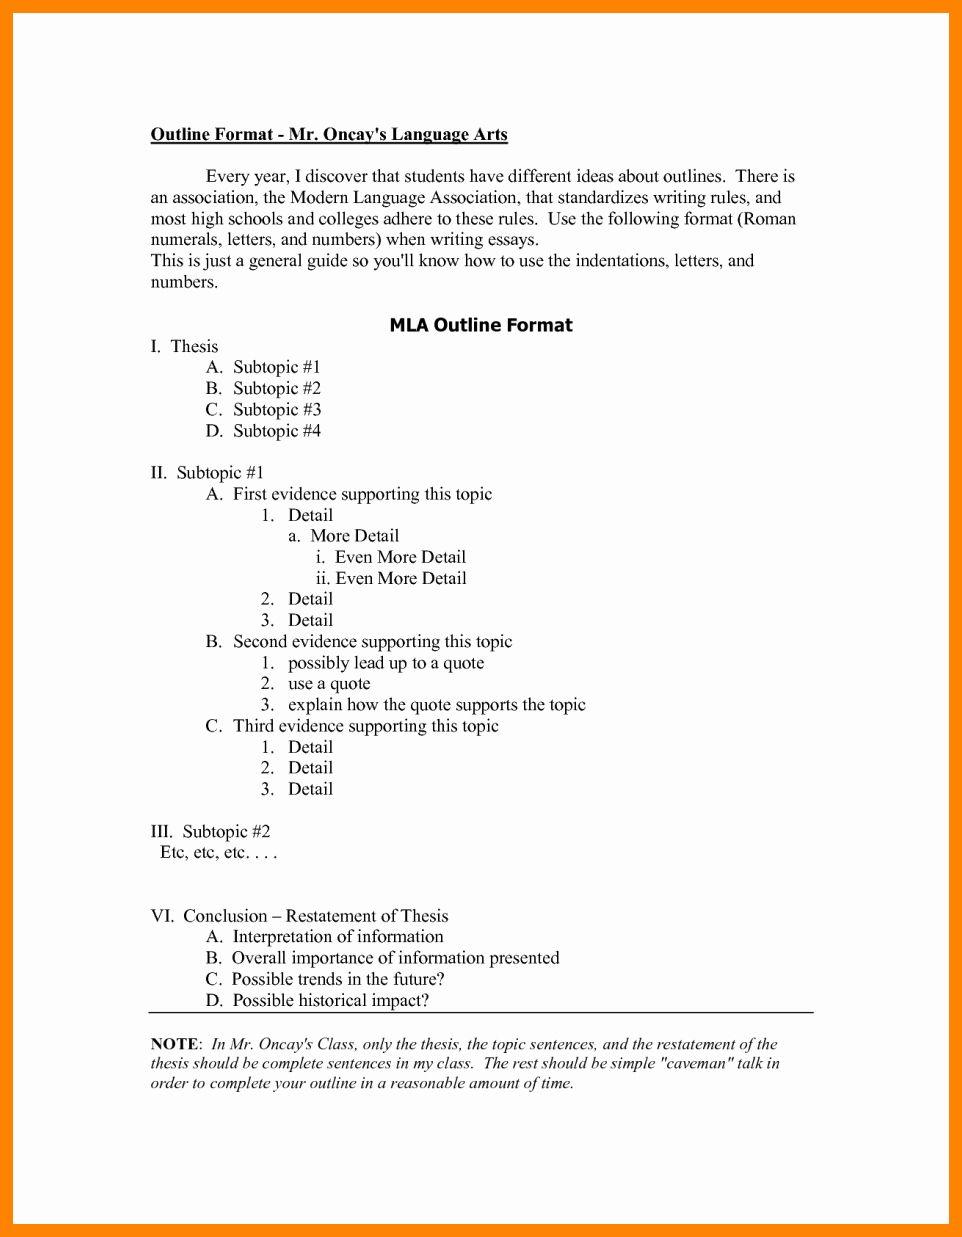 Mla 5 Paragraph Essay Format Elegant 54 Mla 5 Paragraph Essay Format How To Write Essay Outline Format Essay Format Essay Outline